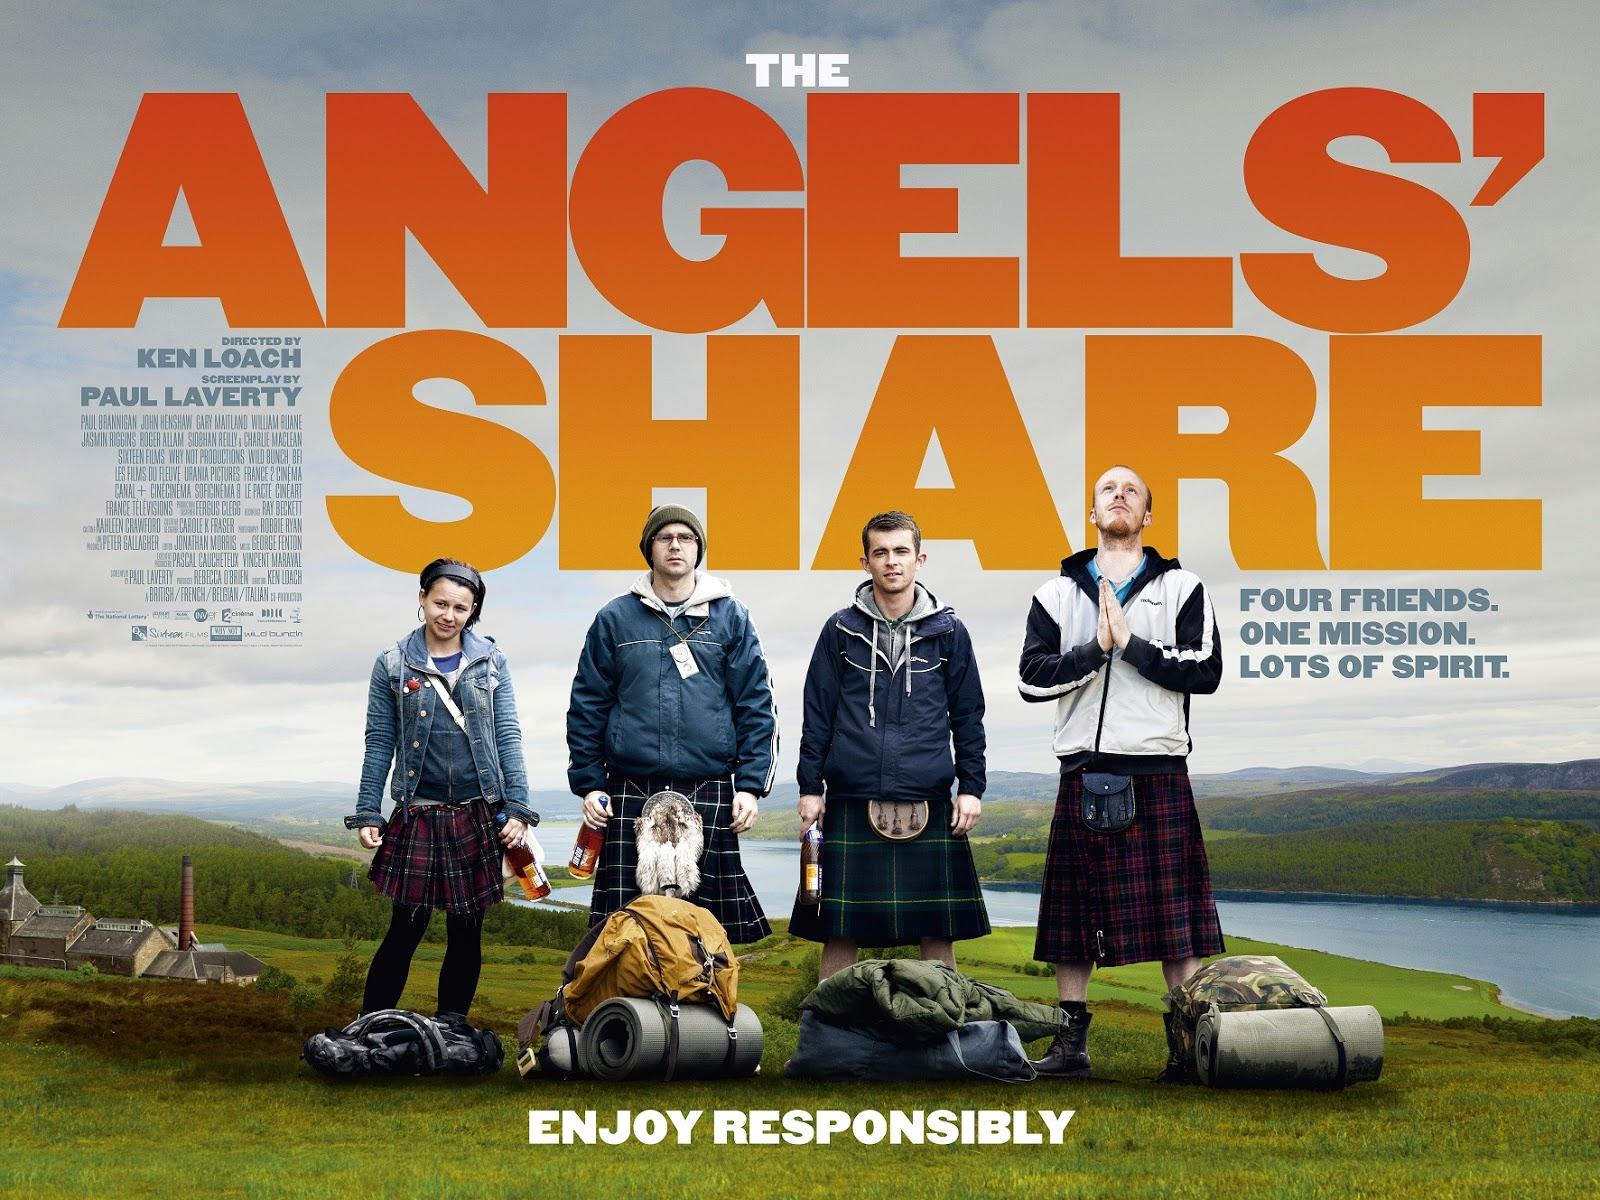 theangelsshare poster